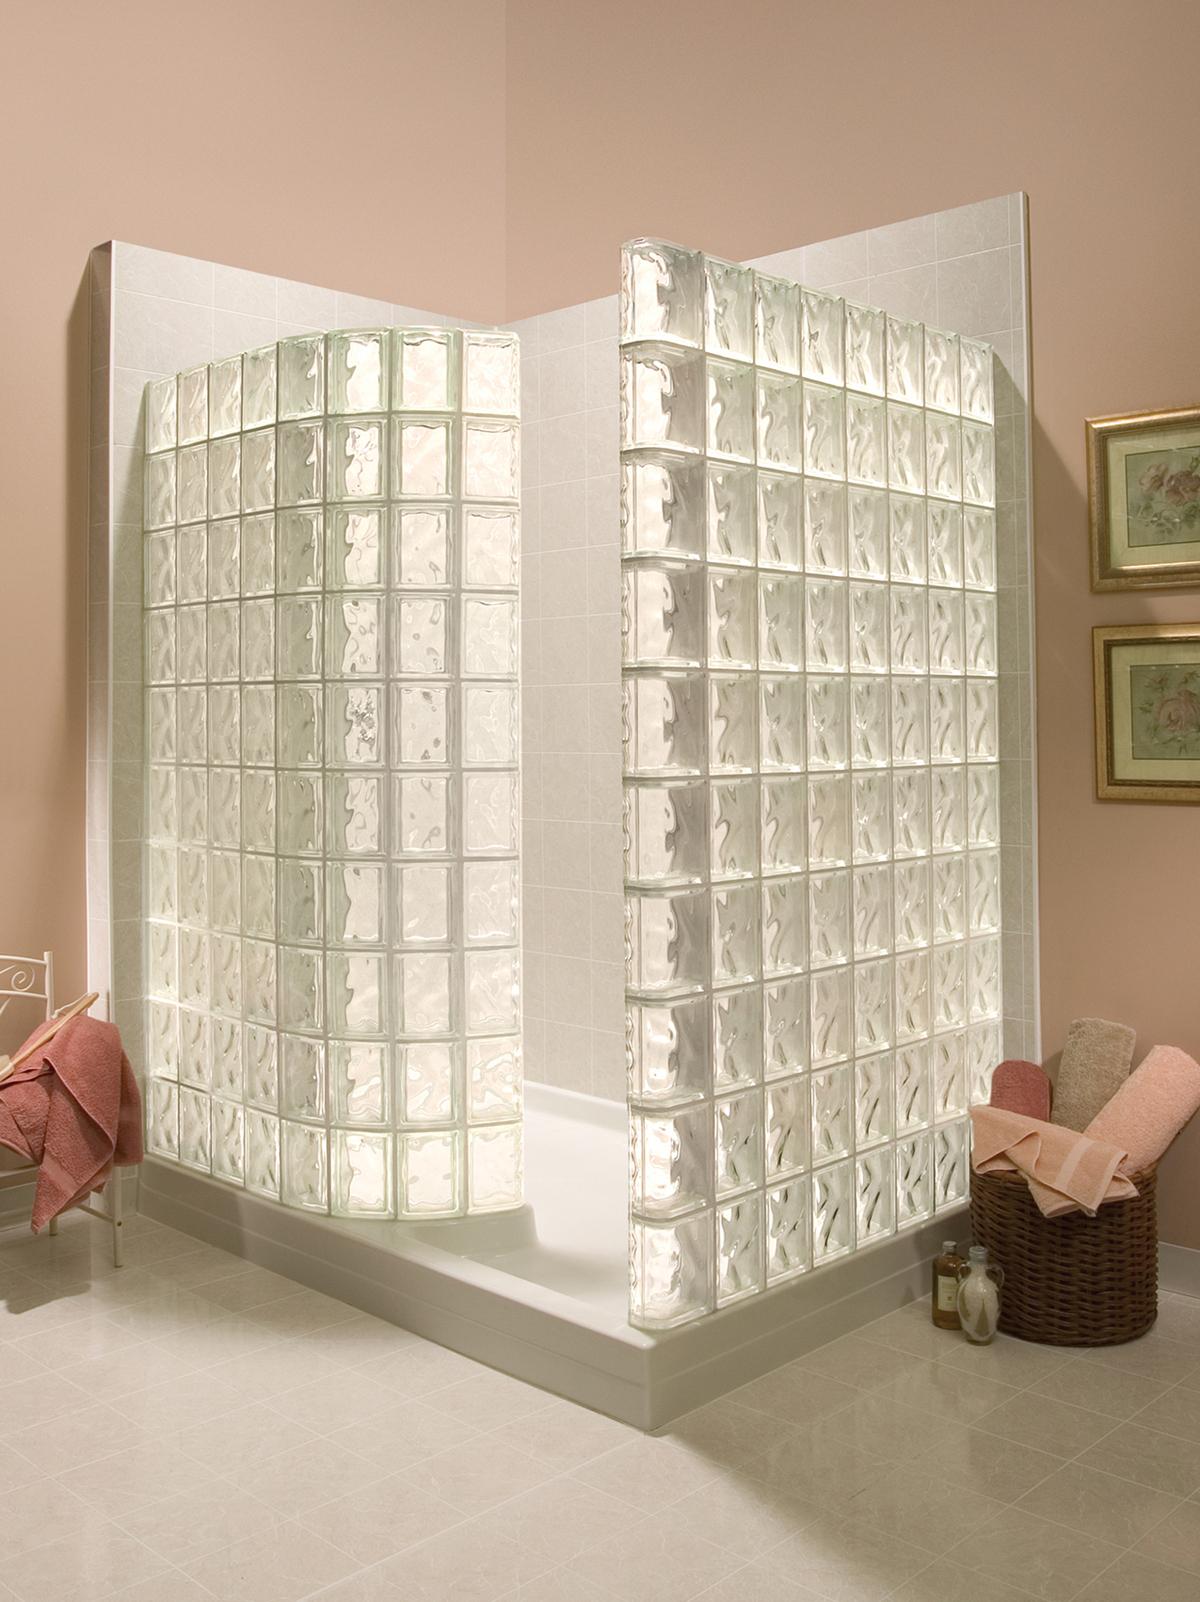 C mo instalar paredes de bloques de vidrio para duchas - Banos con paredes de cristal ...